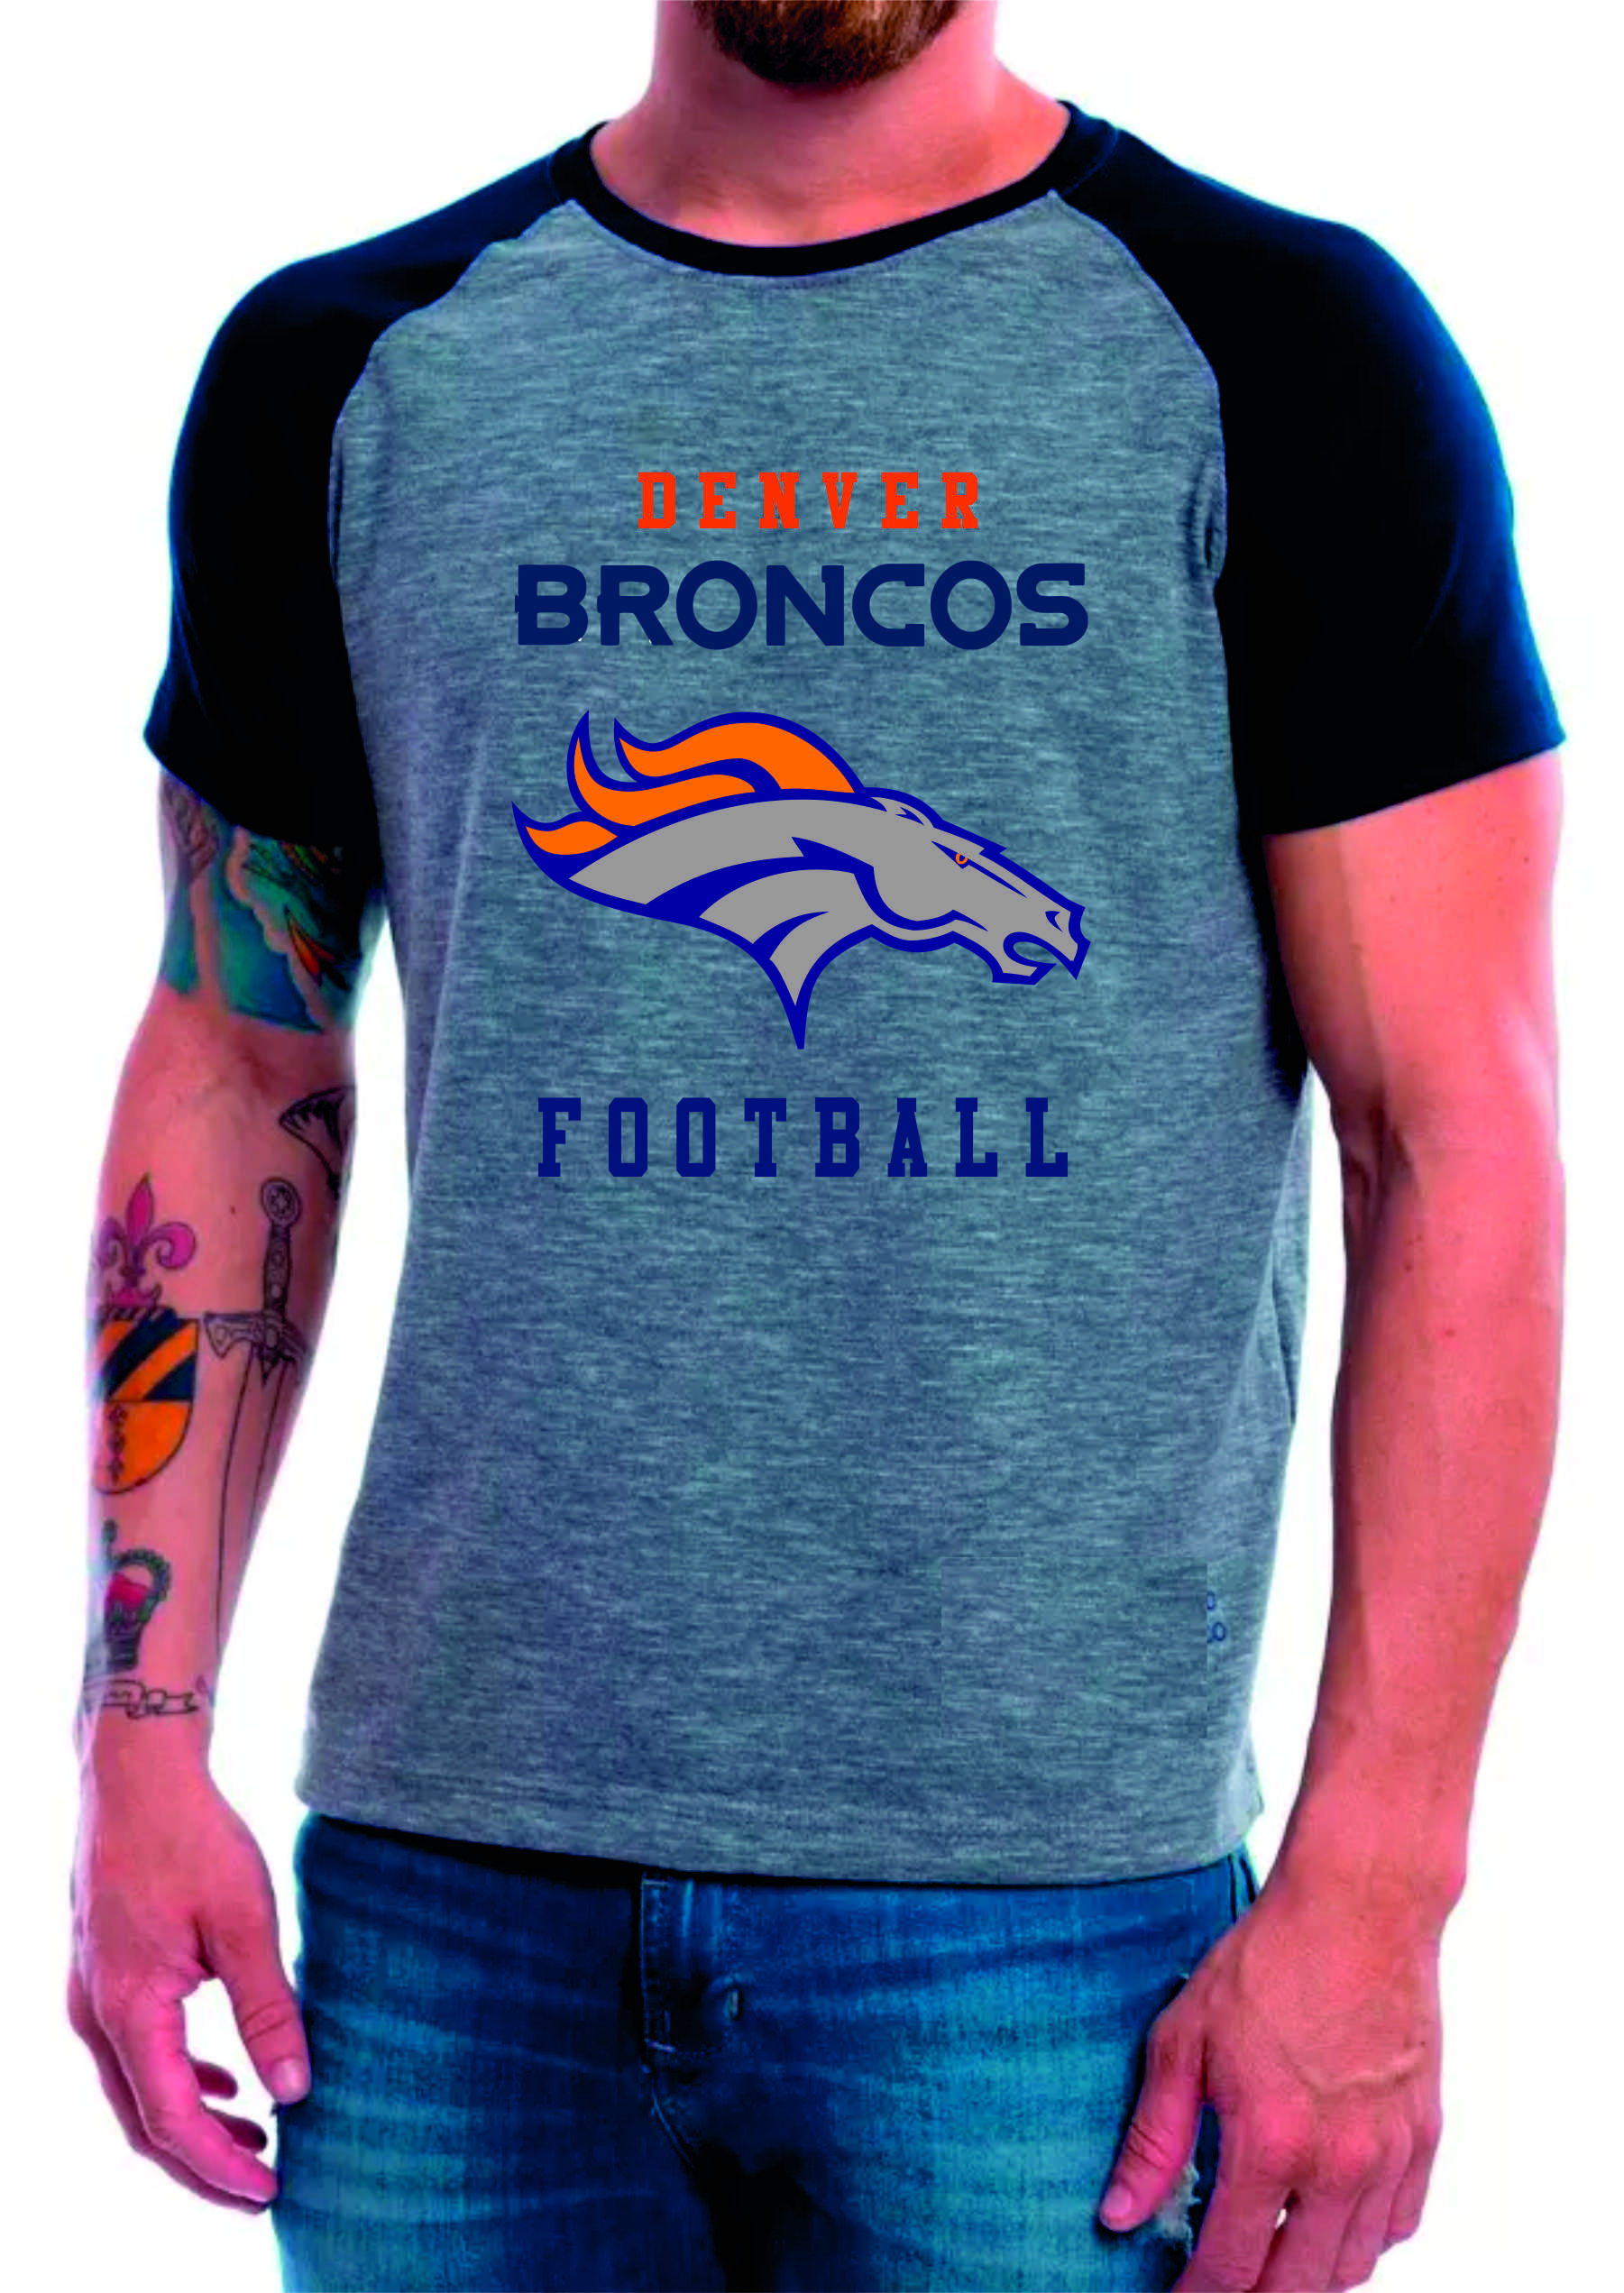 b2b35bb89d Camiseta Raglan Manga Curta Denver Broncos Futebol American no Elo7 ...